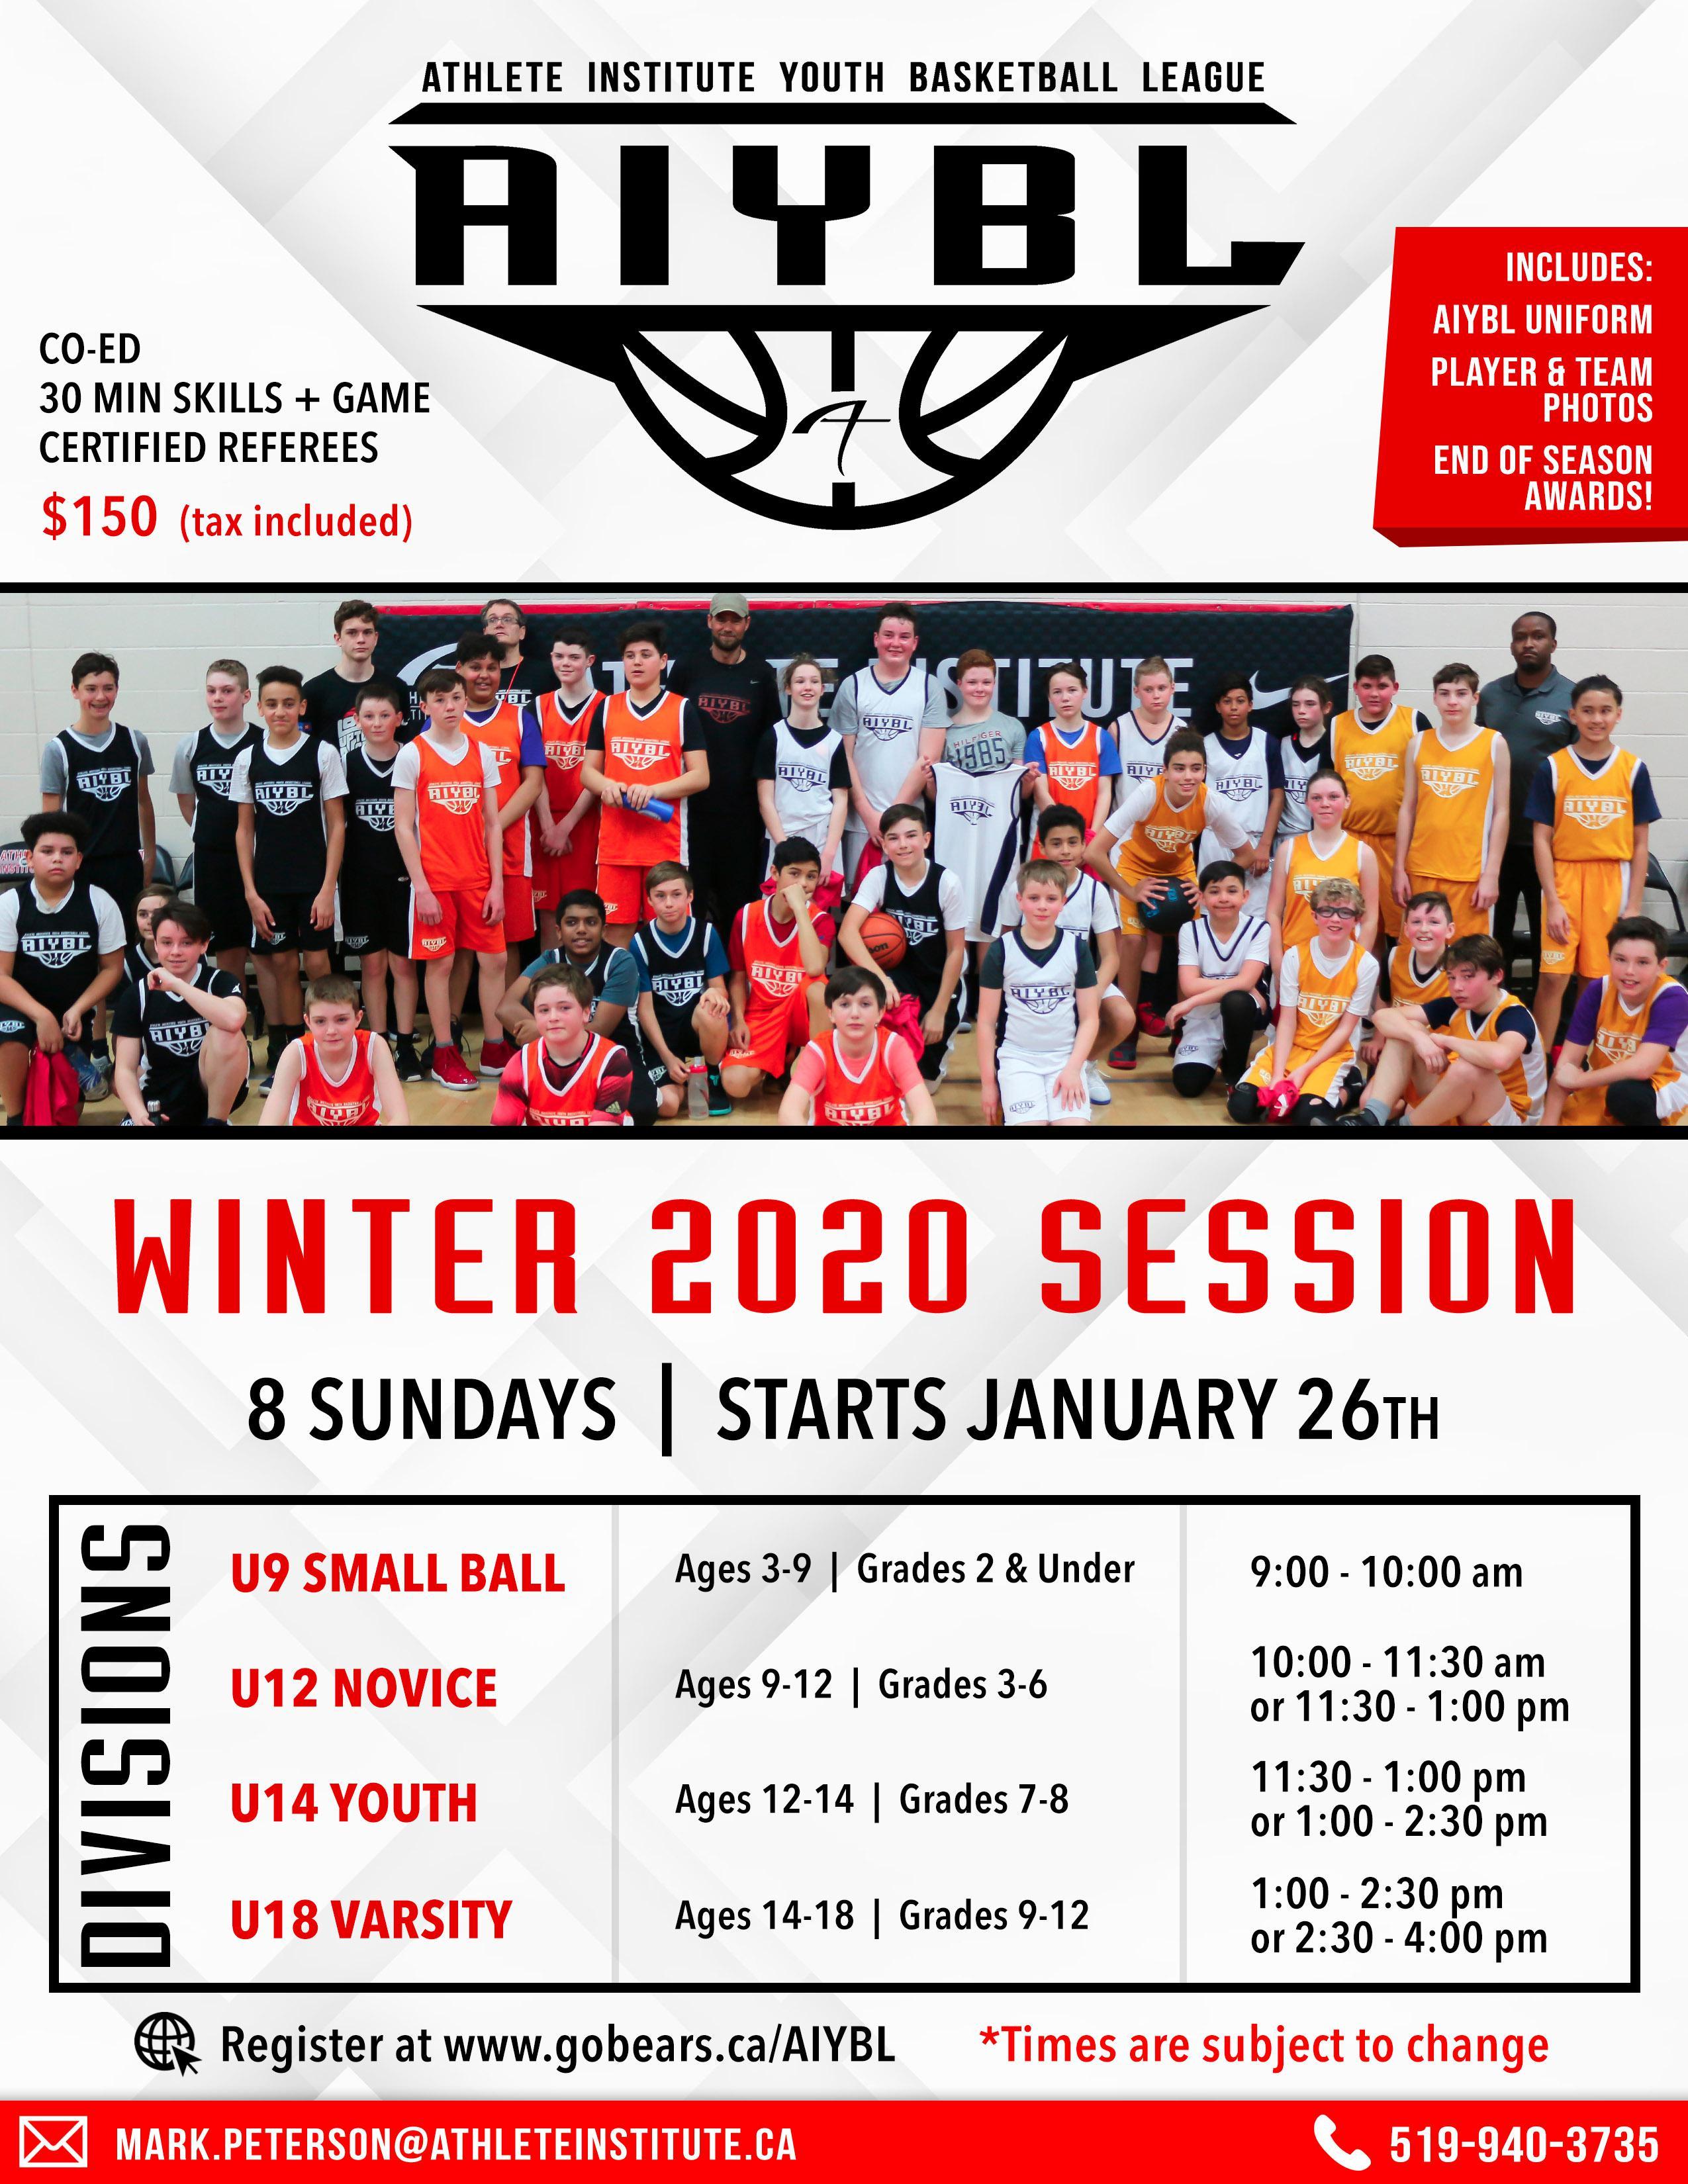 Athlete Institute Youth Basketball League AIYBL House League Orangeville